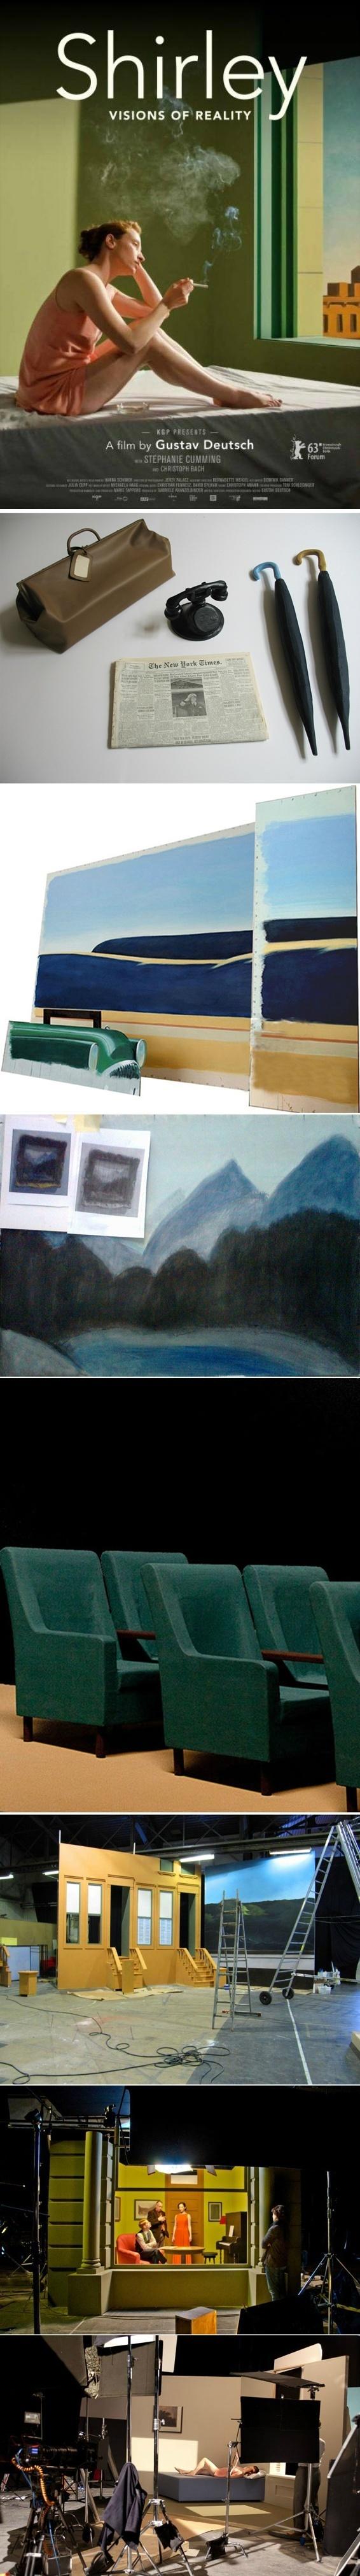 Edward Hopper-qidye-19